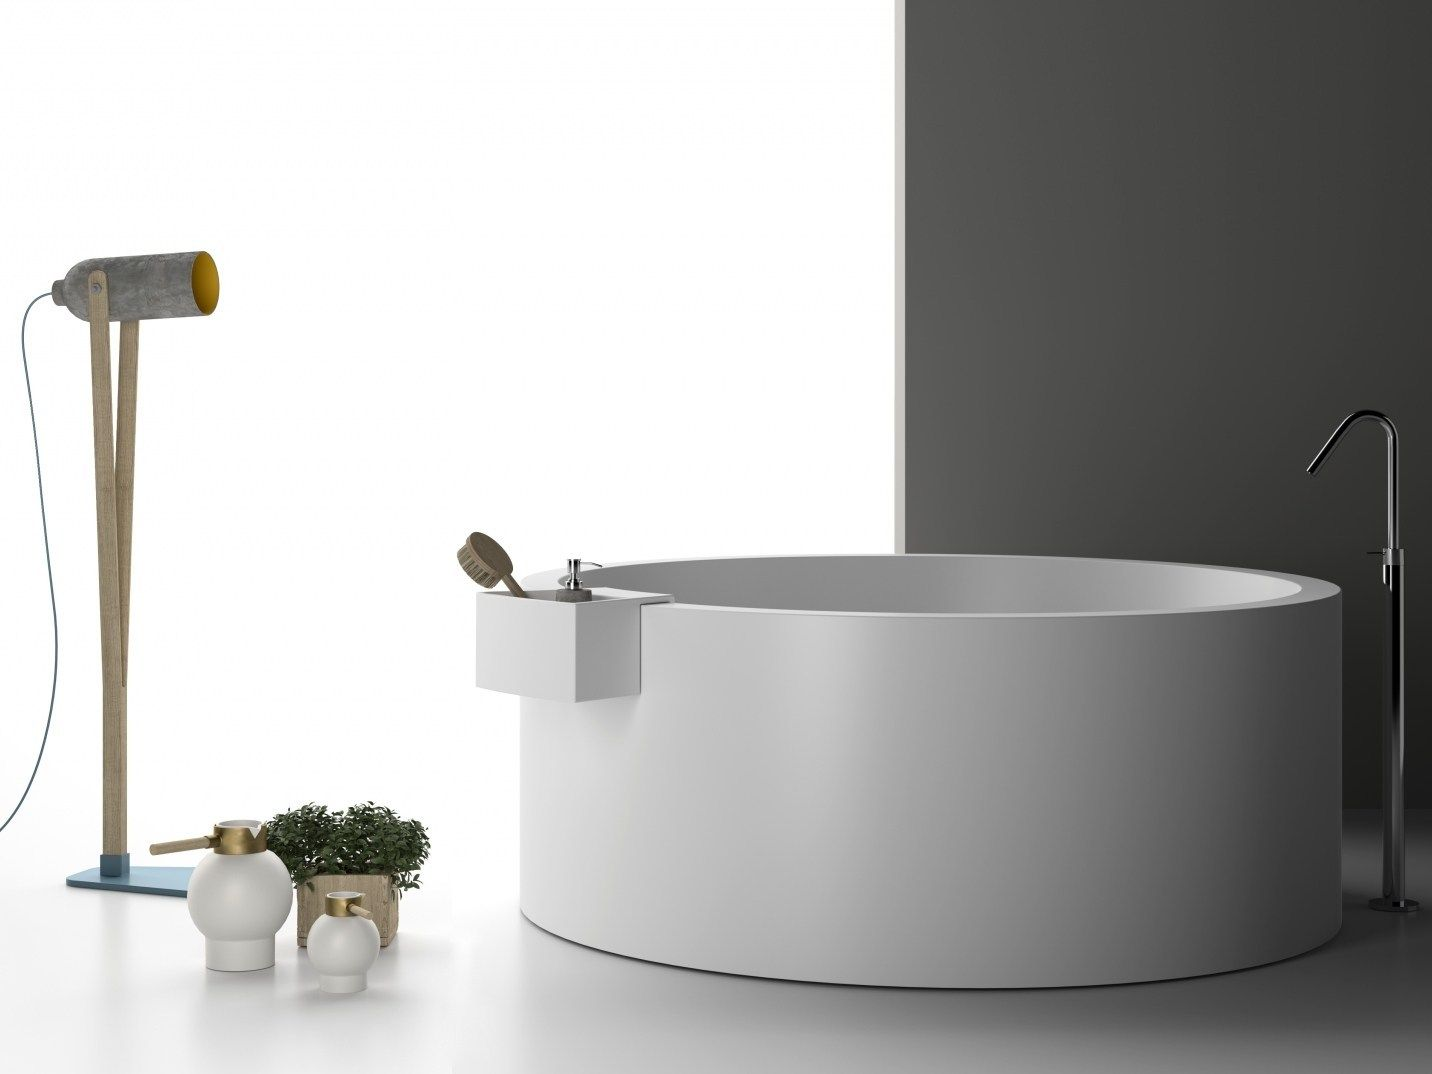 Vasca Da Bagno Freestanding Corian : Planit presenta la nuova vasca freestanding in corian